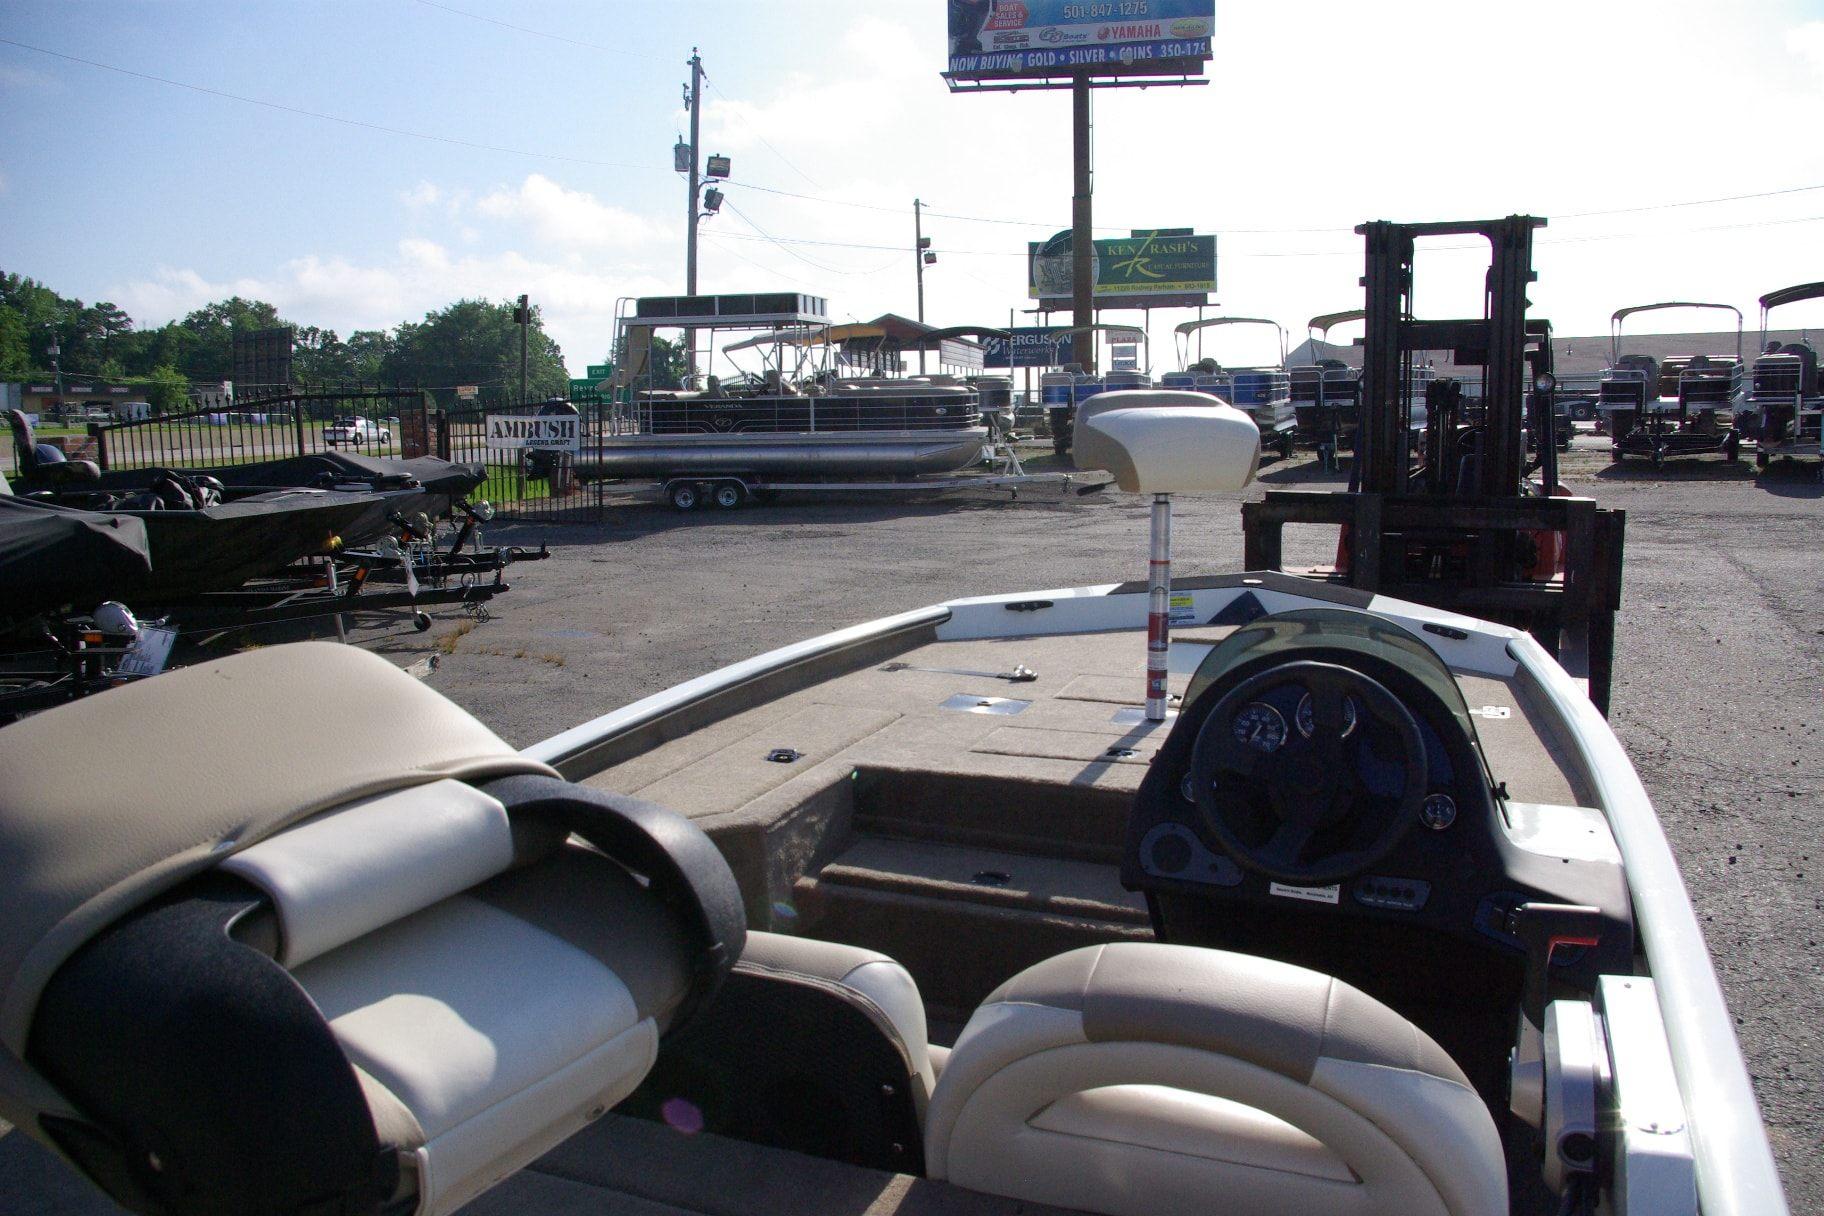 BIKE SEAT & FISHING CHAIR INCLUDED